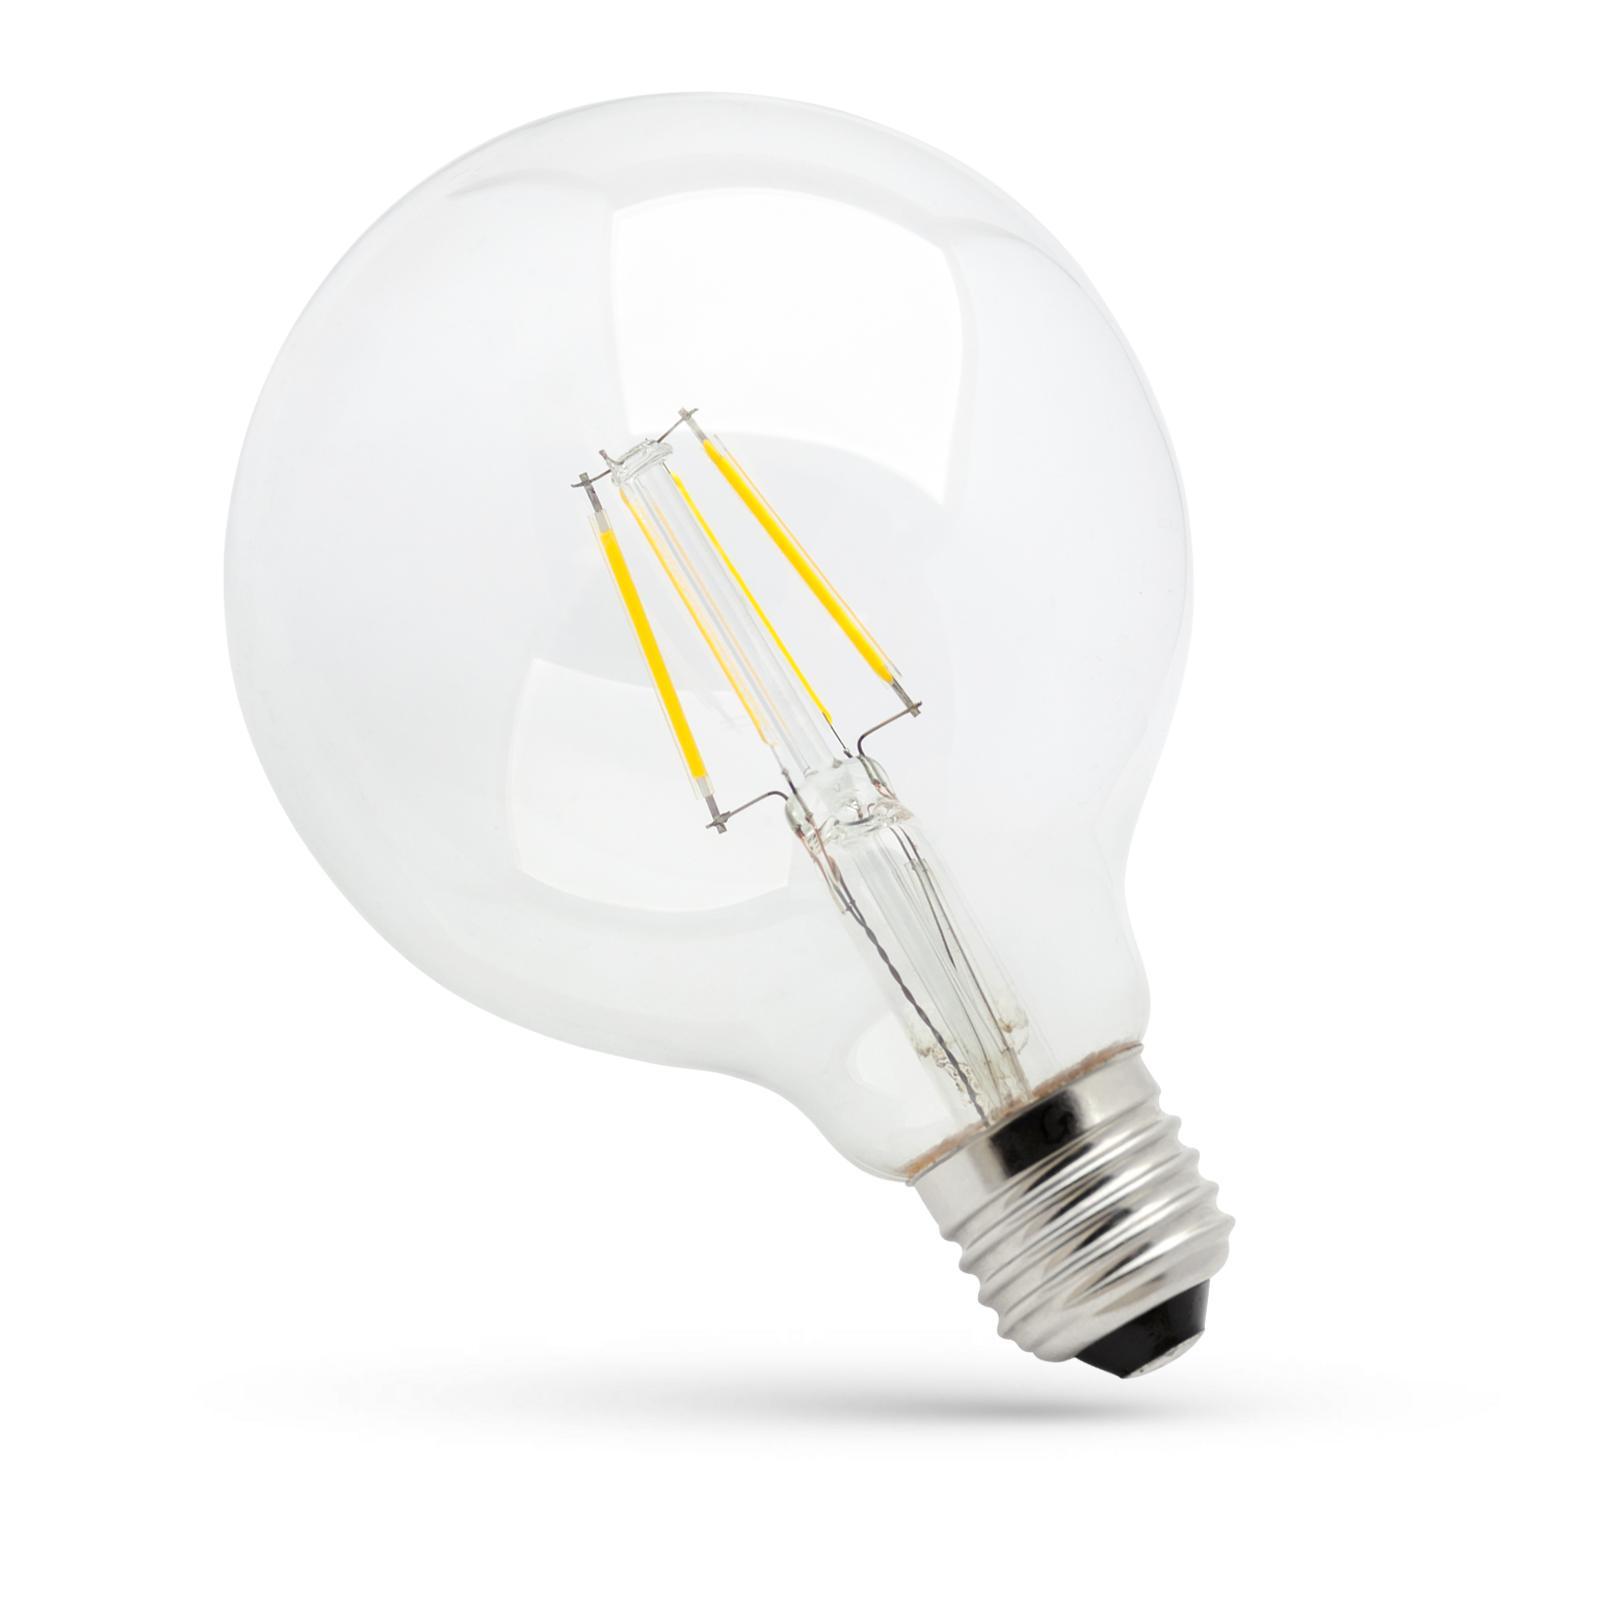 LED G95 COG E-27 230V 4W WW CLEAR SPECTRUM